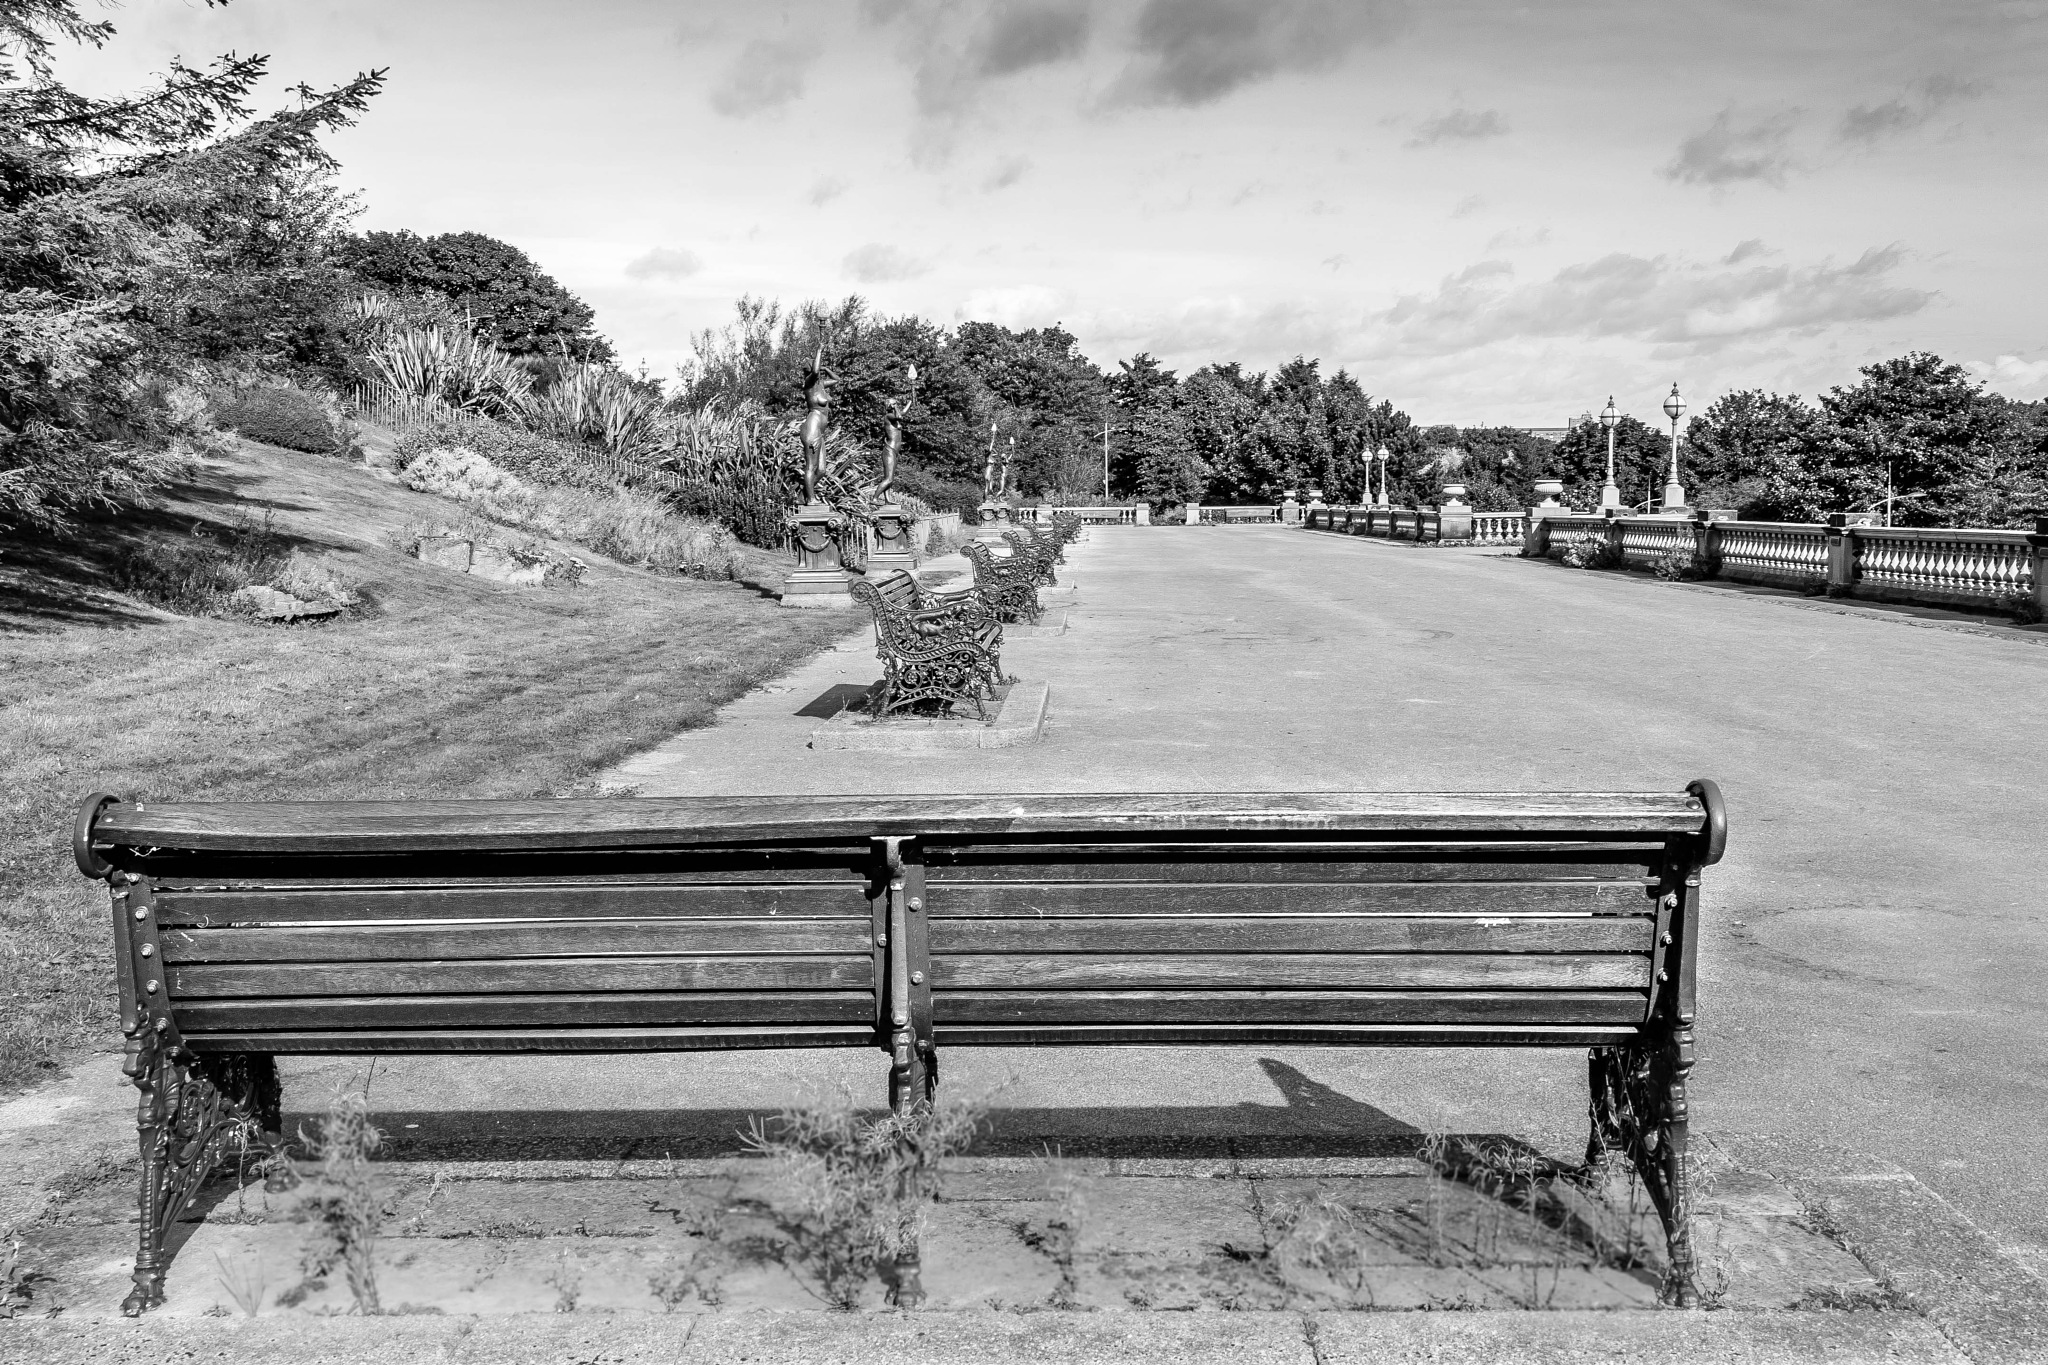 Park Life 1 by DRJonsey